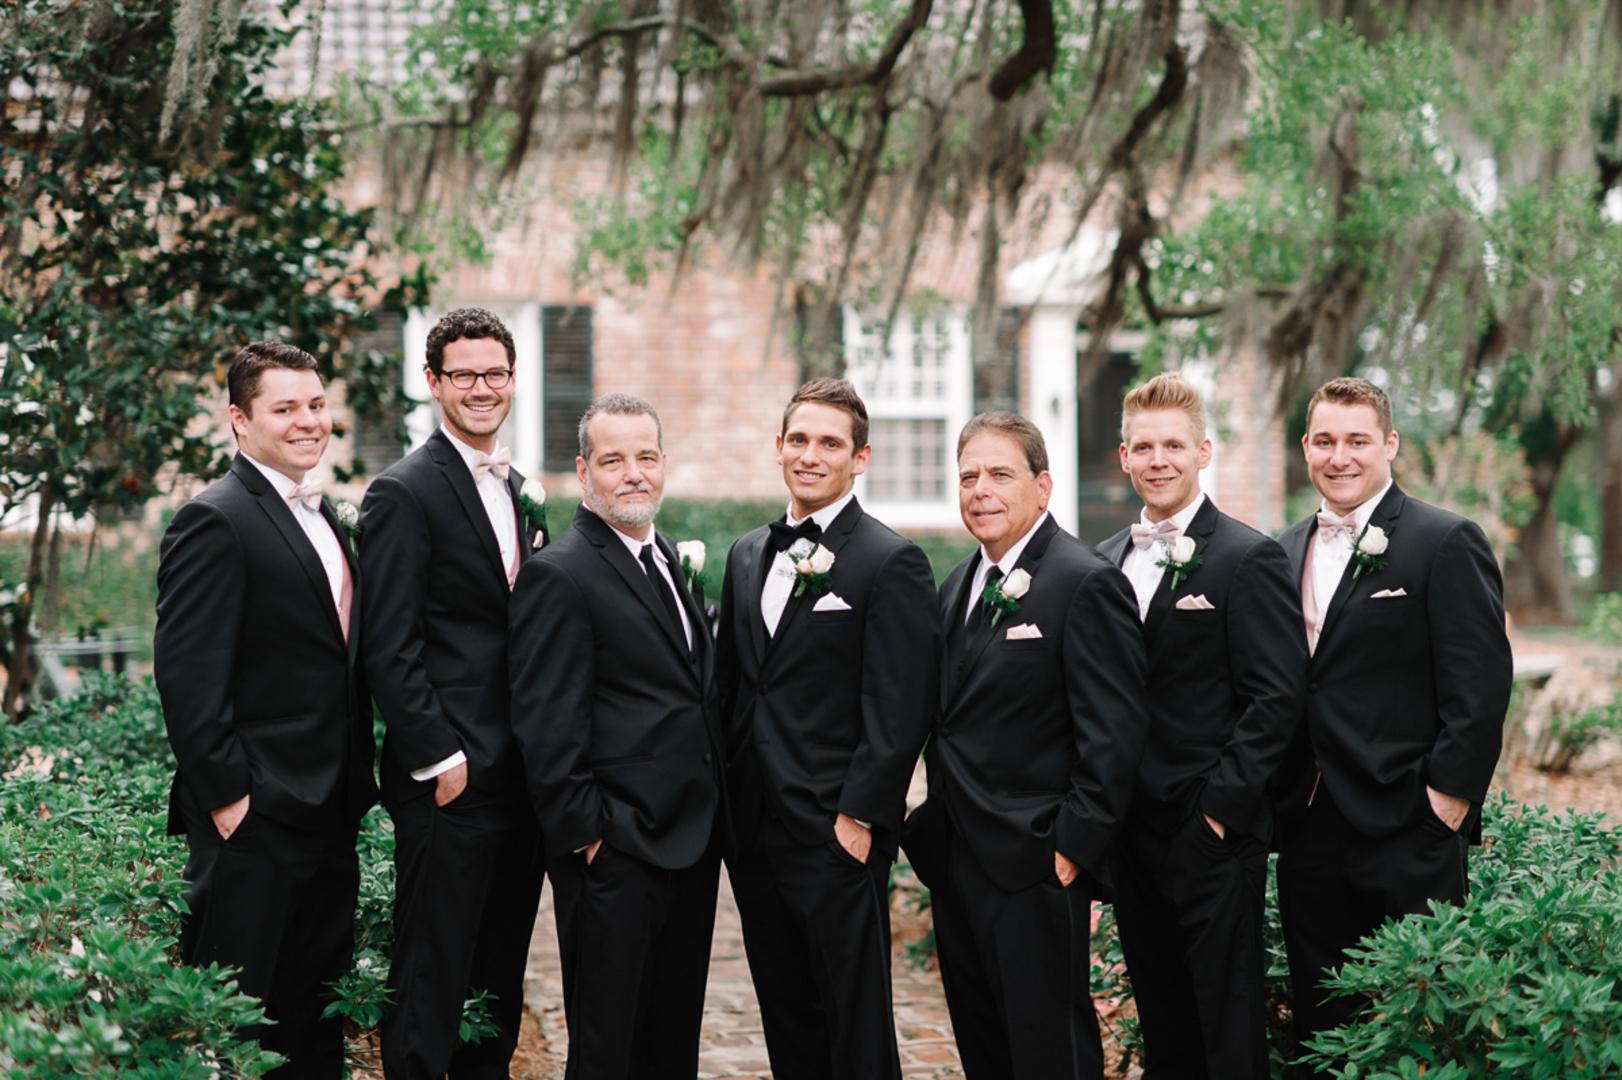 mansfield-plantation-wedding-6.jpg